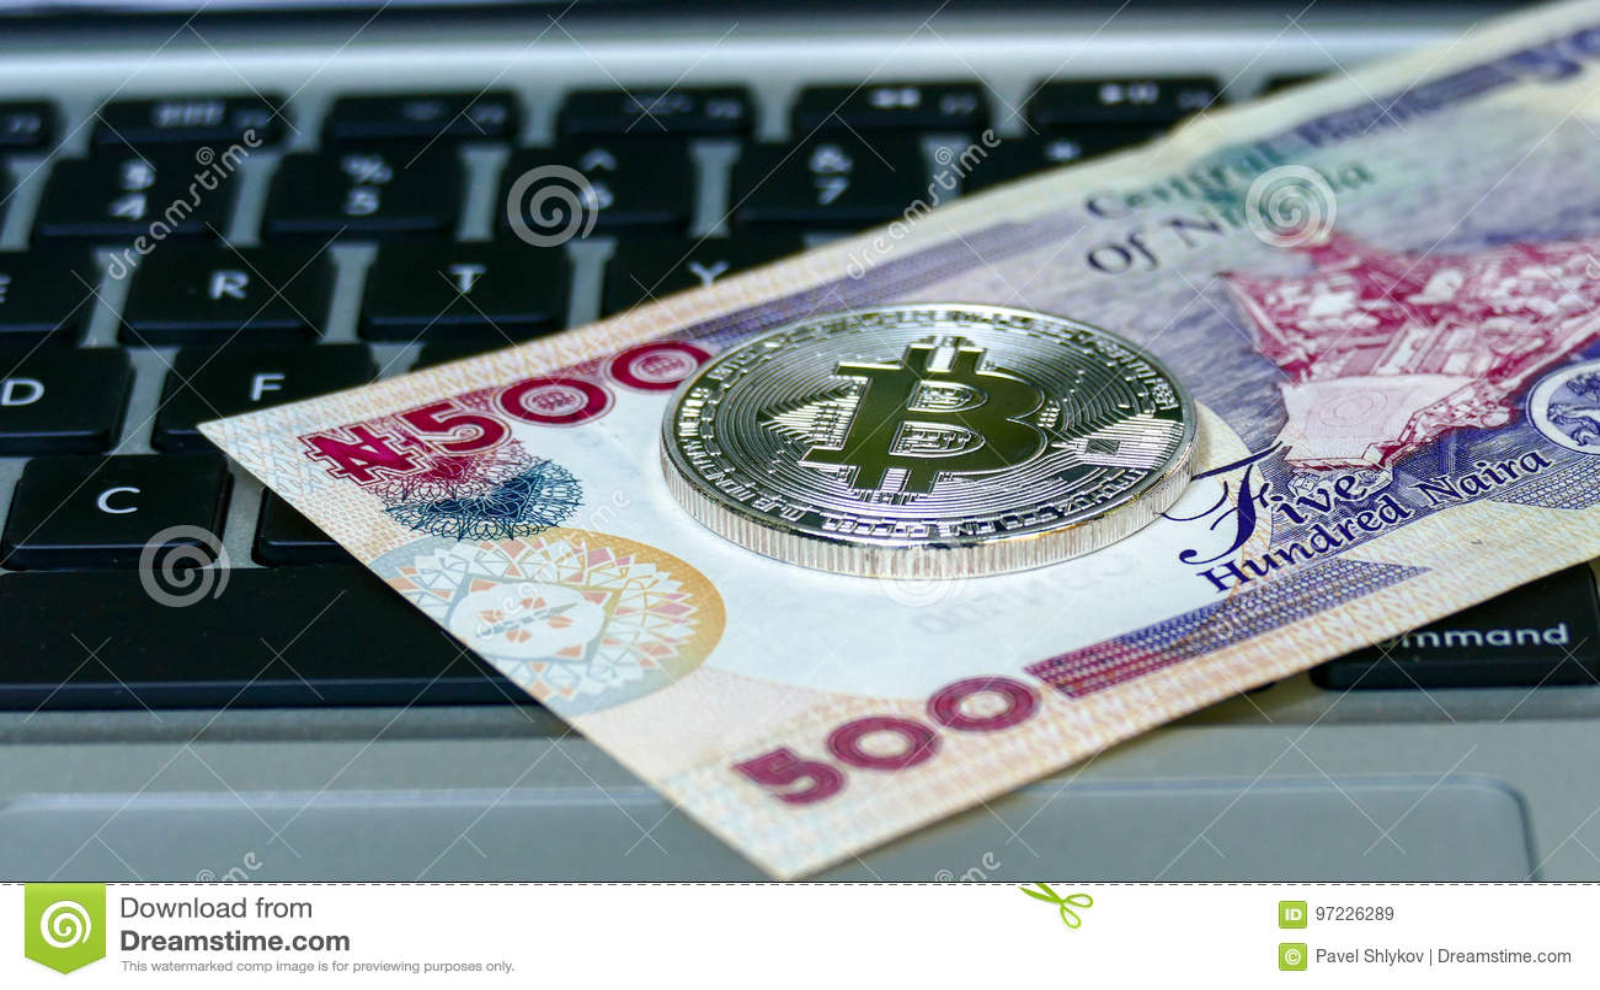 Download Bitcoin on naira bills. stock image. Image of naira, finance - 97226289